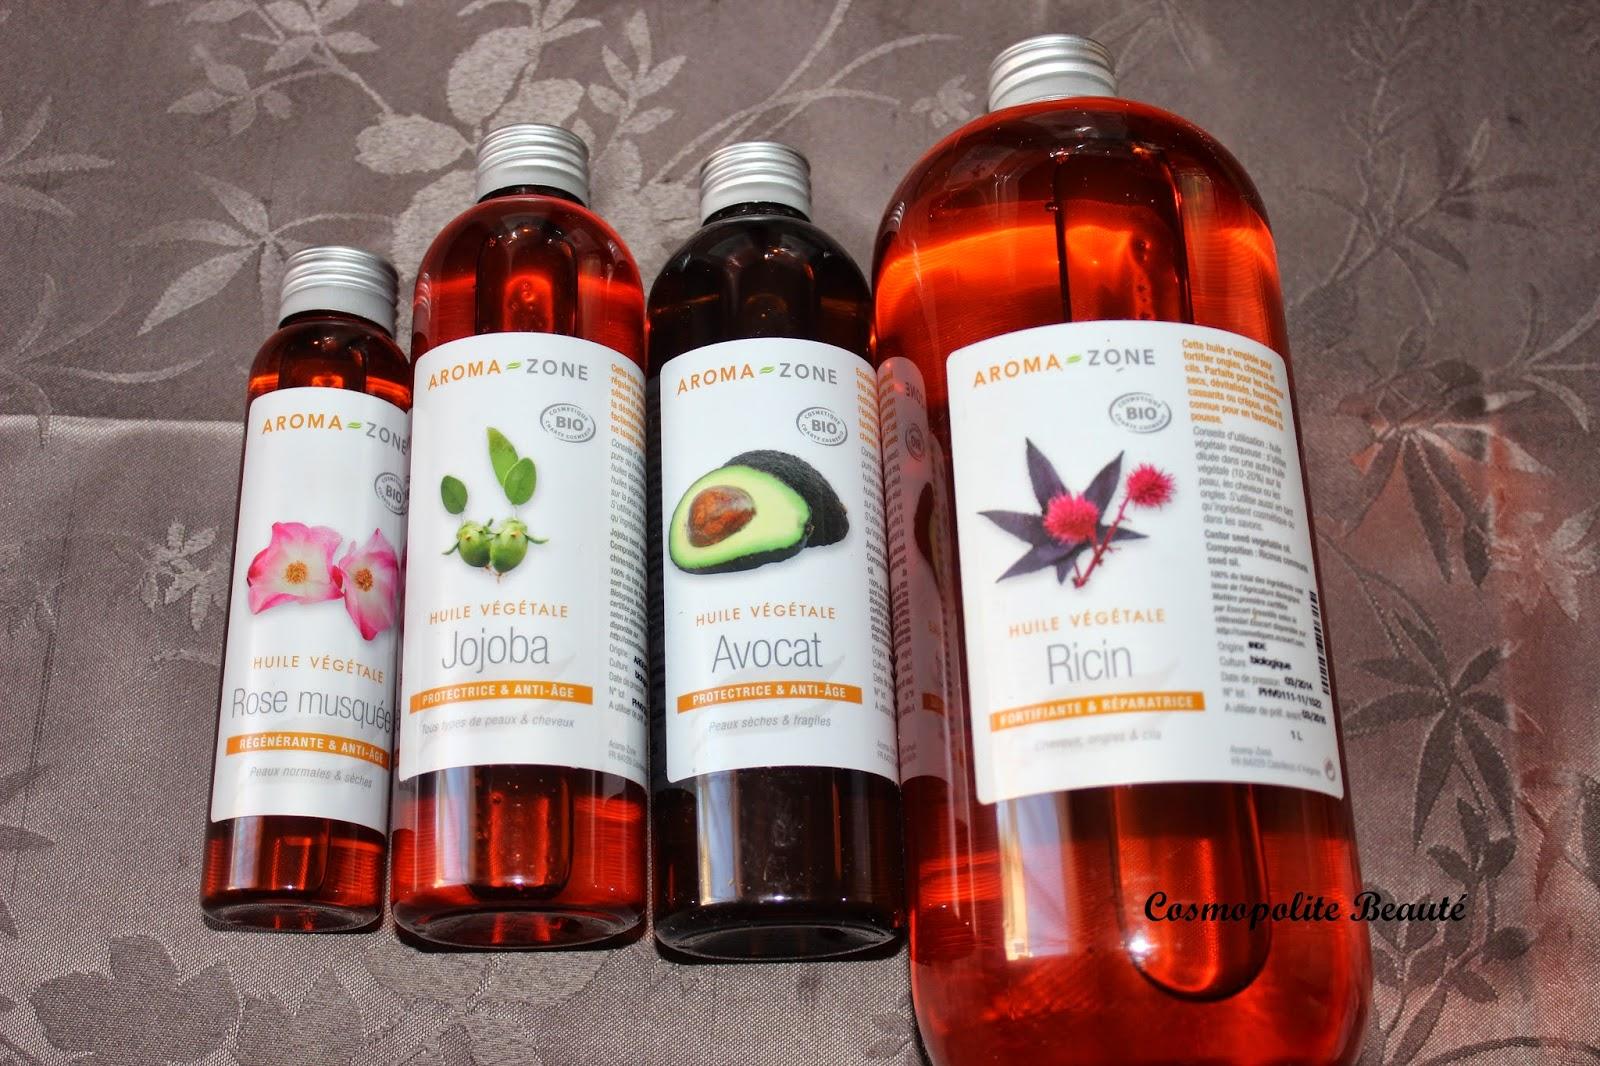 huiles végétales, jojoba, ricin, avocat, aroma-zone